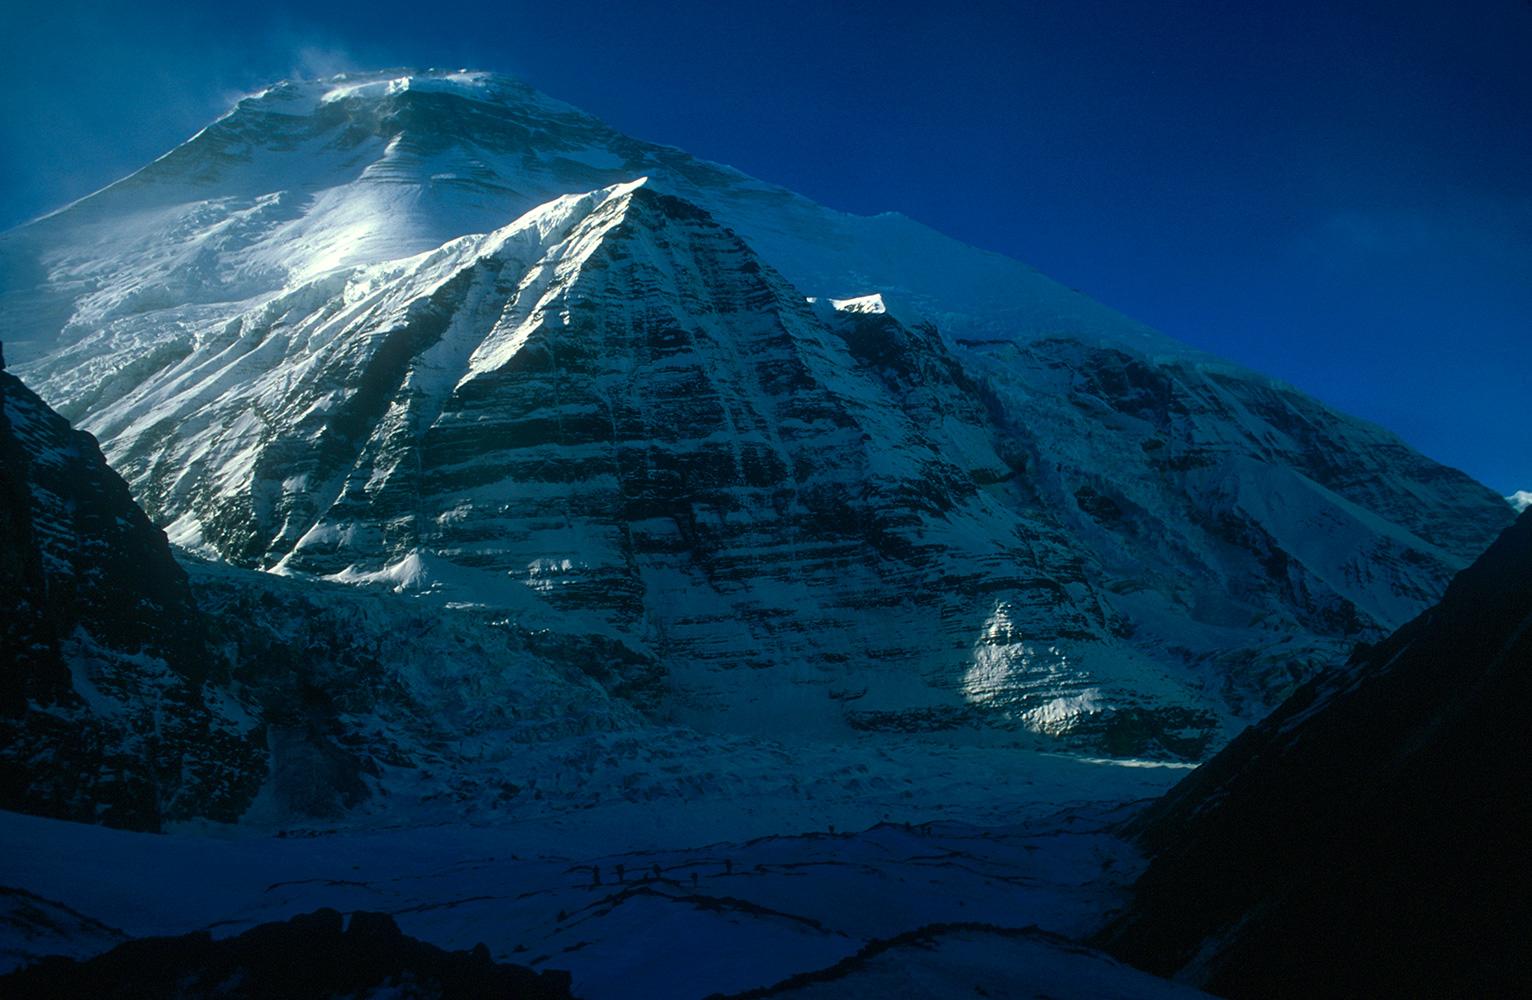 From just above base-camp on the Chhonbardan glacier.Nikon FM2, 24mm, Fuji Velvia